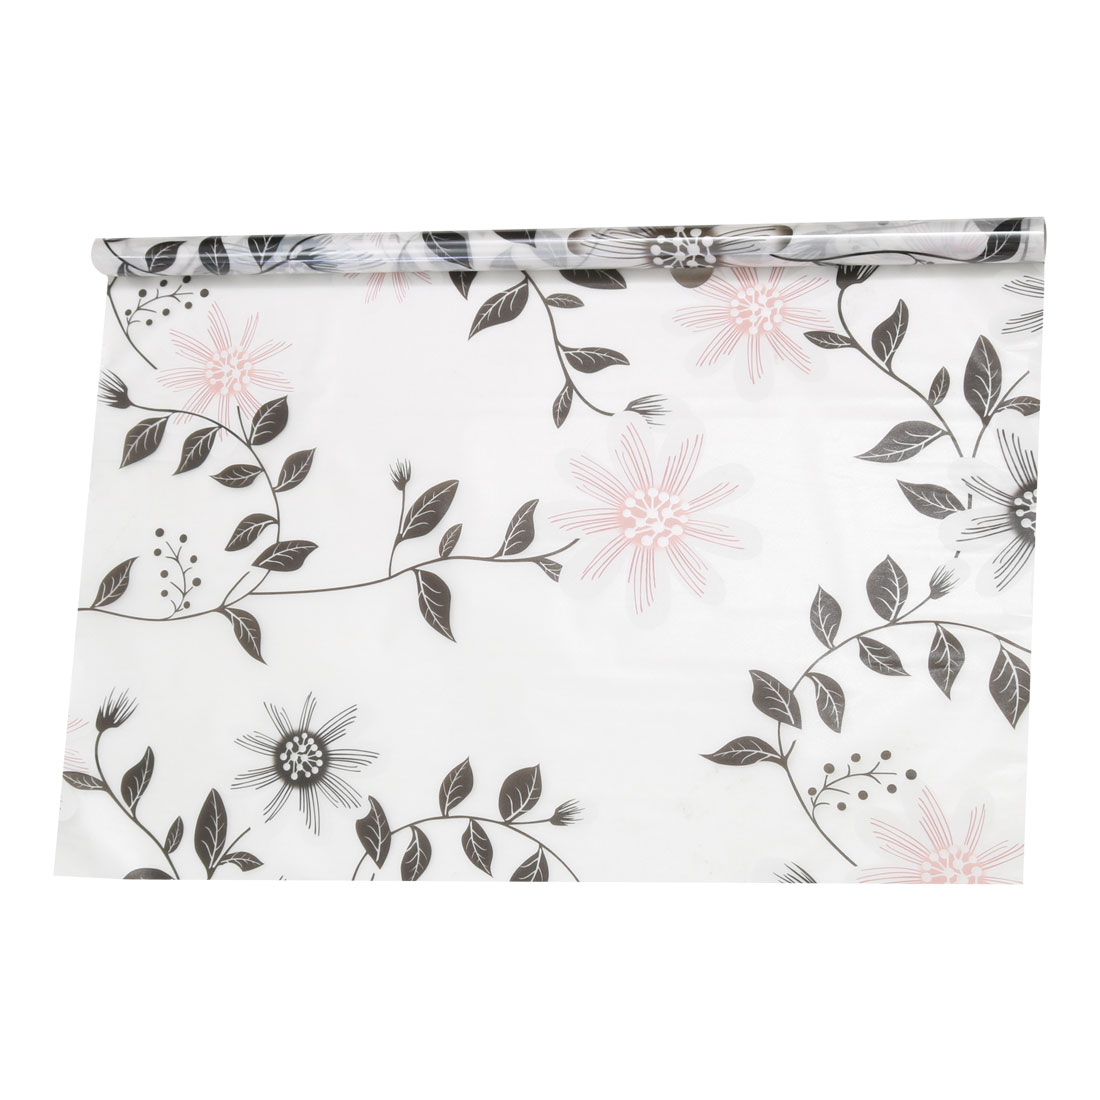 PVC 23.6 x 78.7 Inch Anti UV Glass Window Film Sticker Delicate Flower Pattern